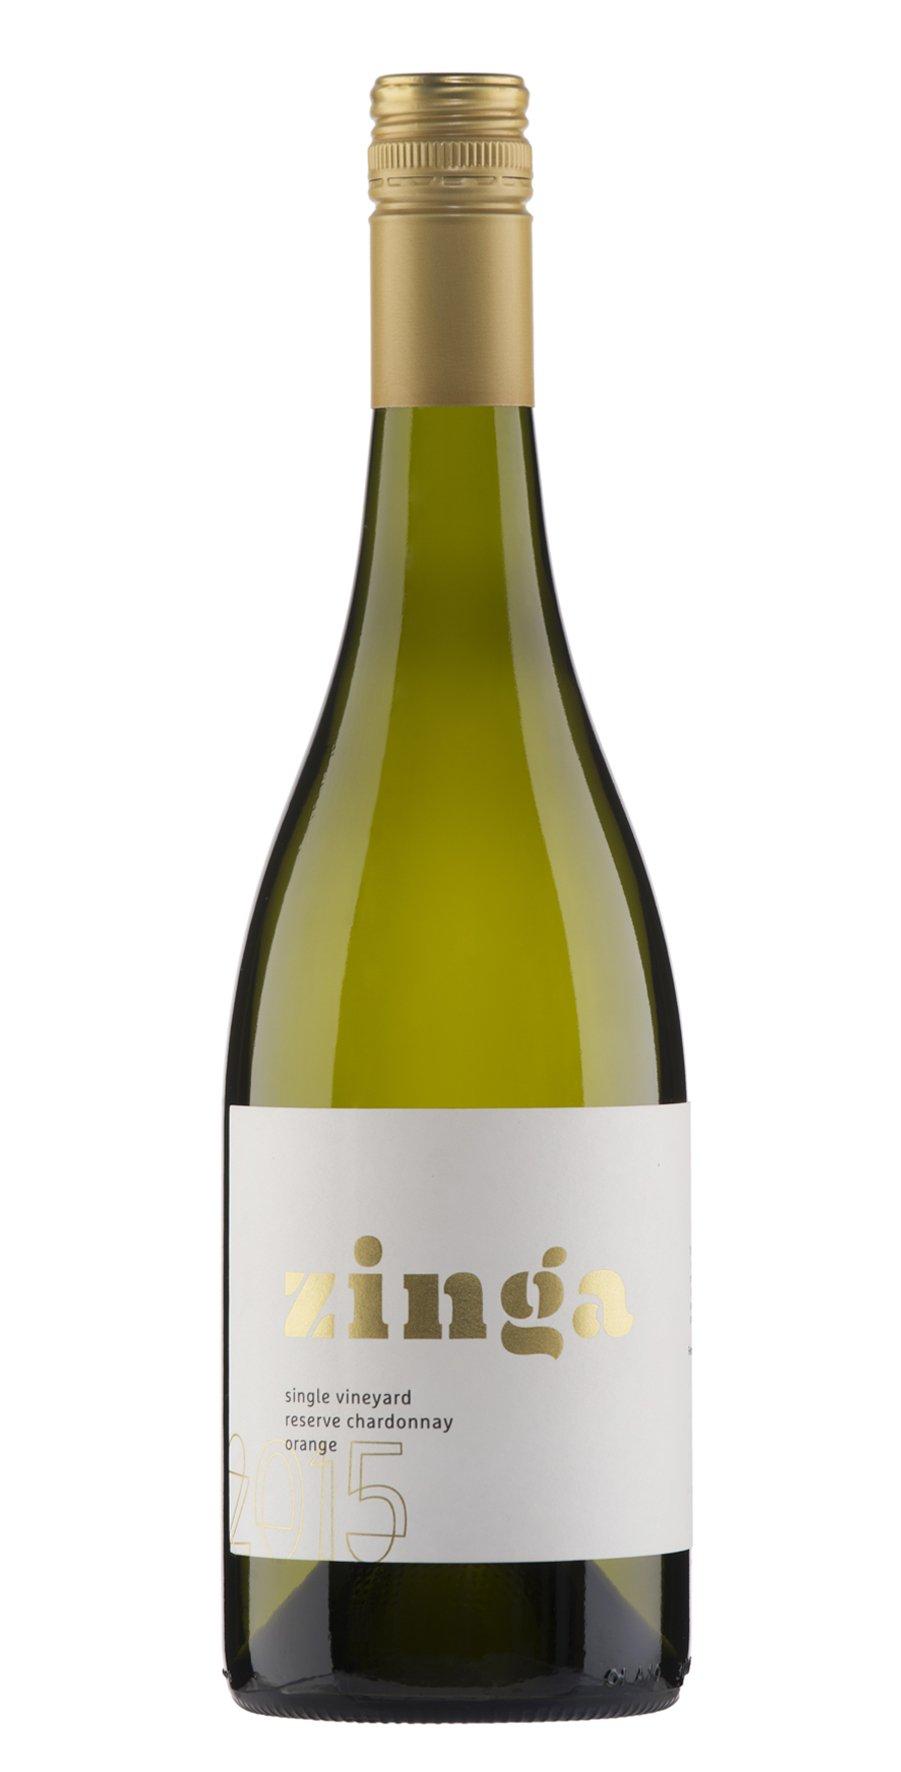 Zinga 2015 Single Vineyard Reserve Chardonnay